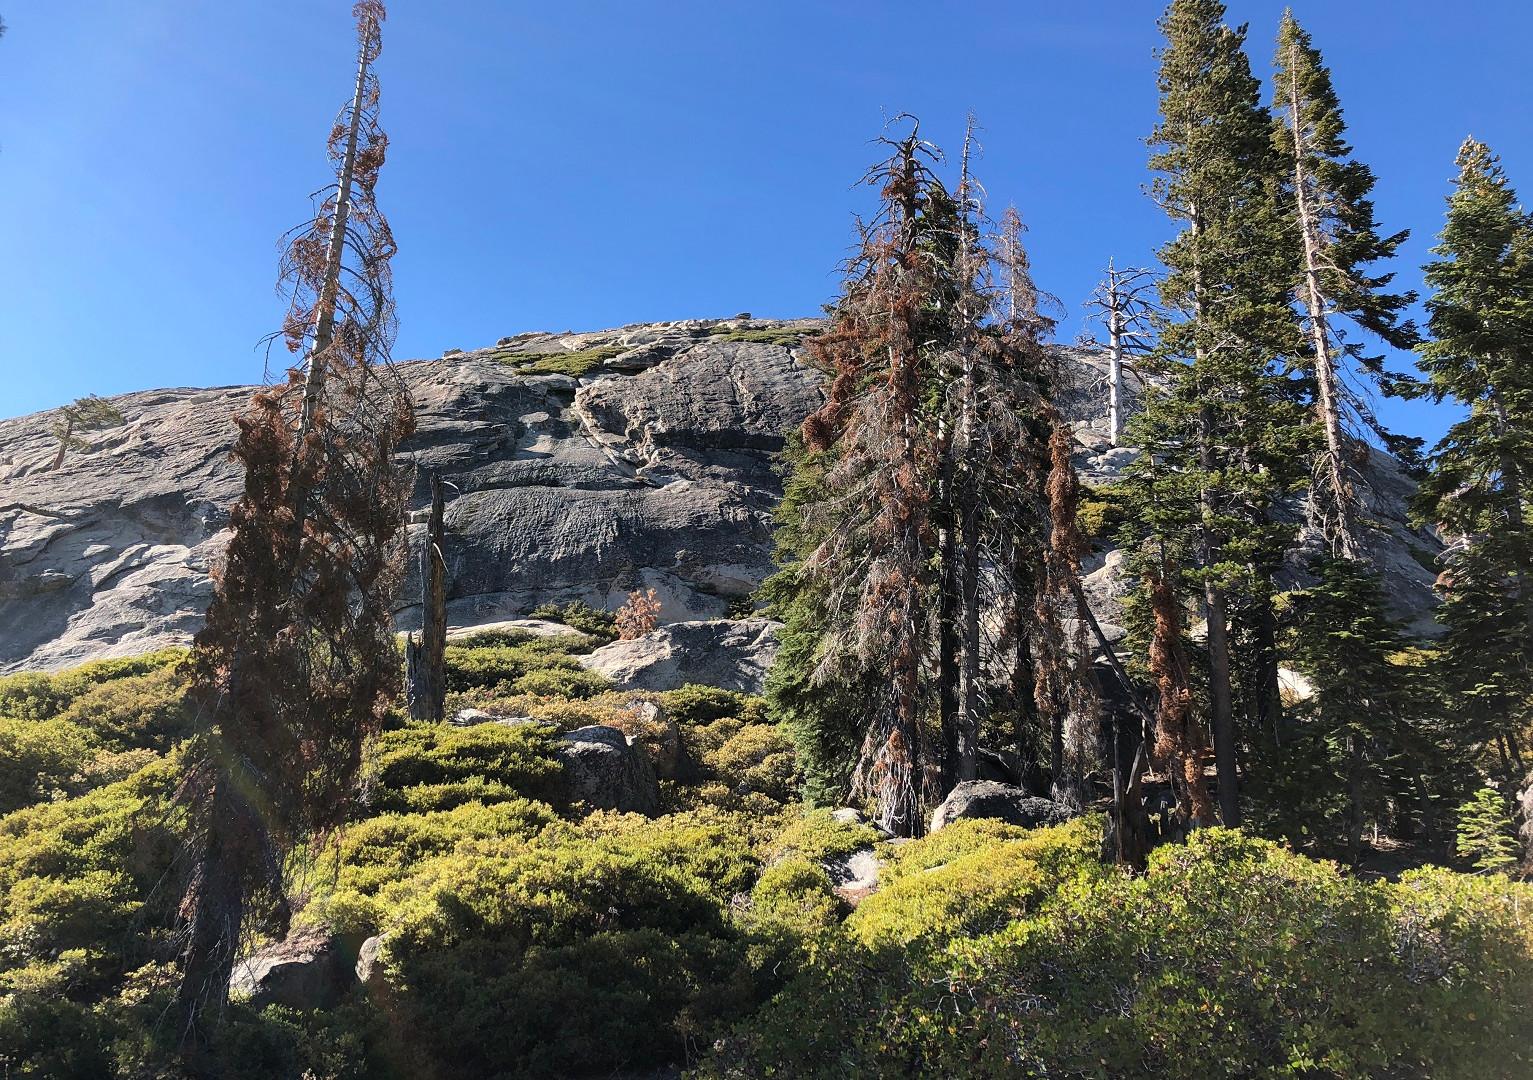 IMG_9102 Yosemite drought tree.jpg